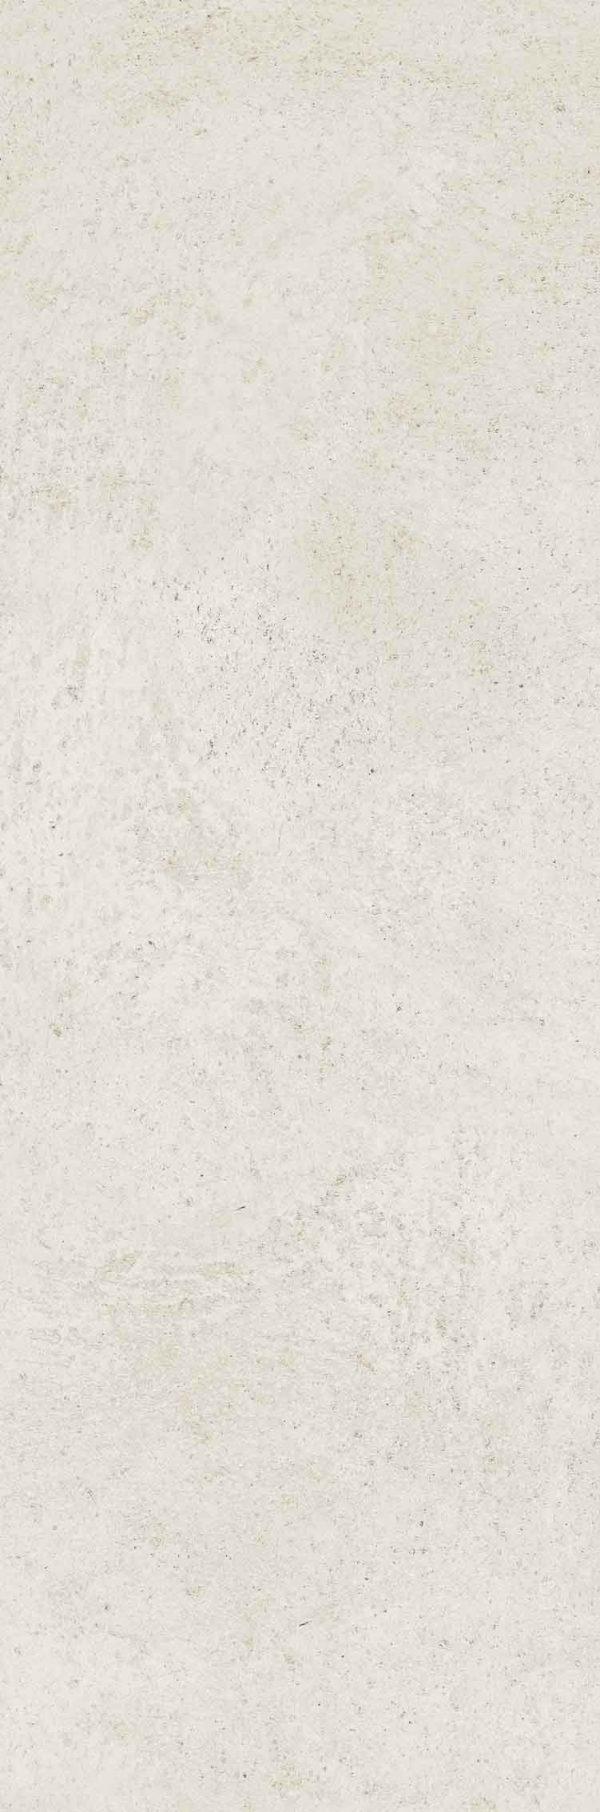 Maps of Cerim White Matte 6mm 80 x 240